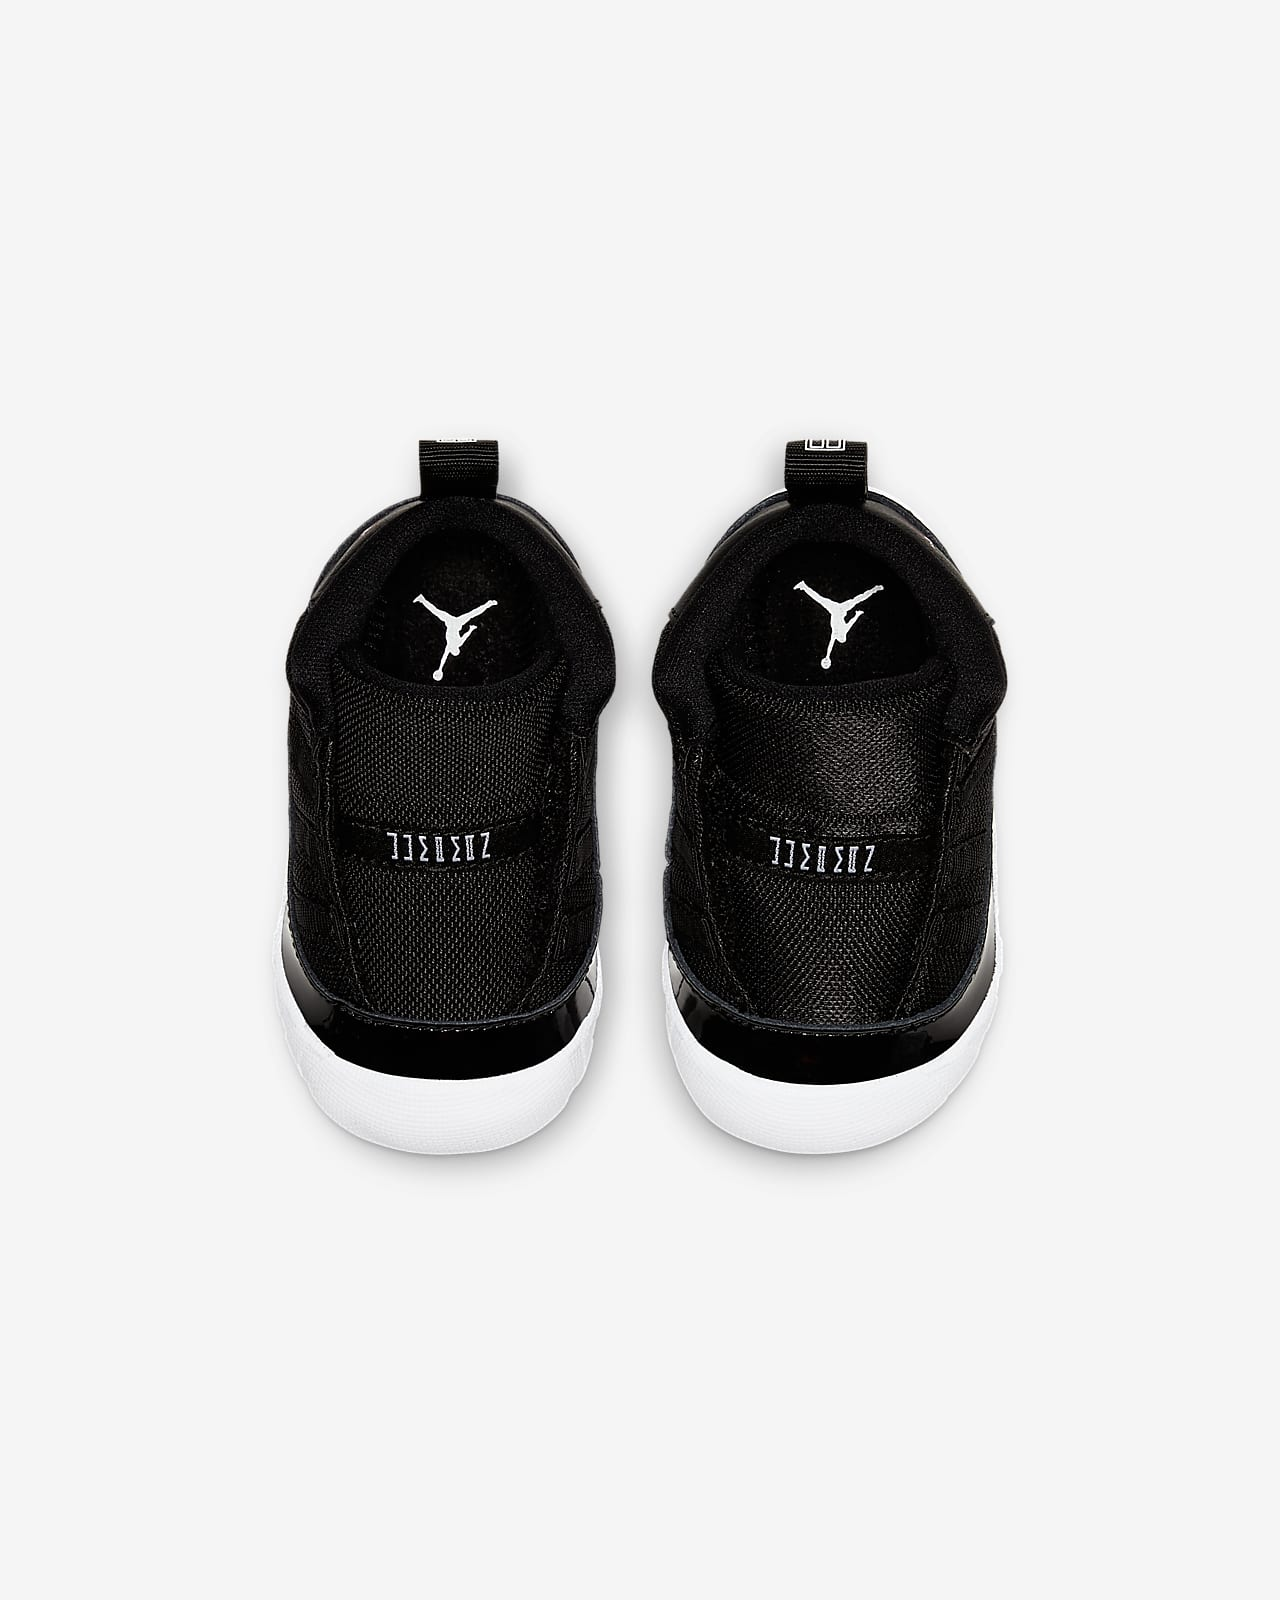 Chausson Jordan 11 pour Bébé. Nike LU